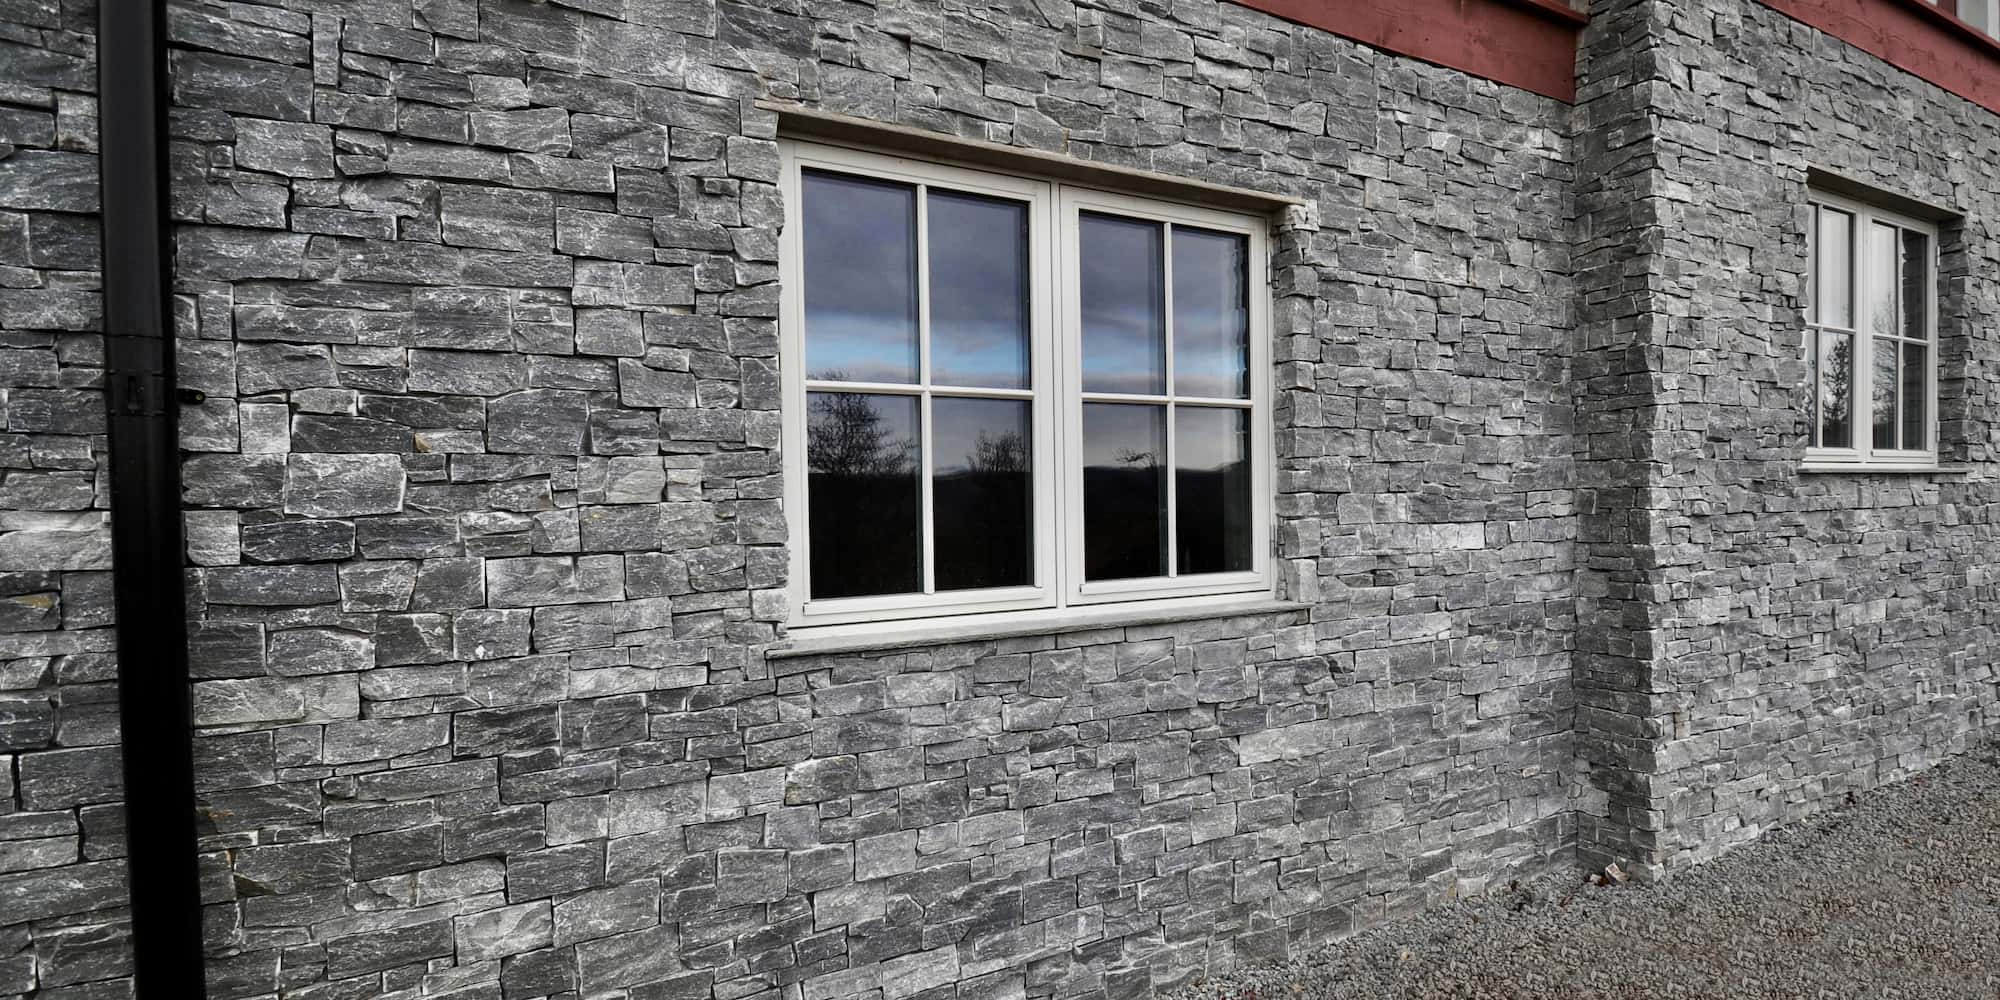 Trysil Steinpanel fasade